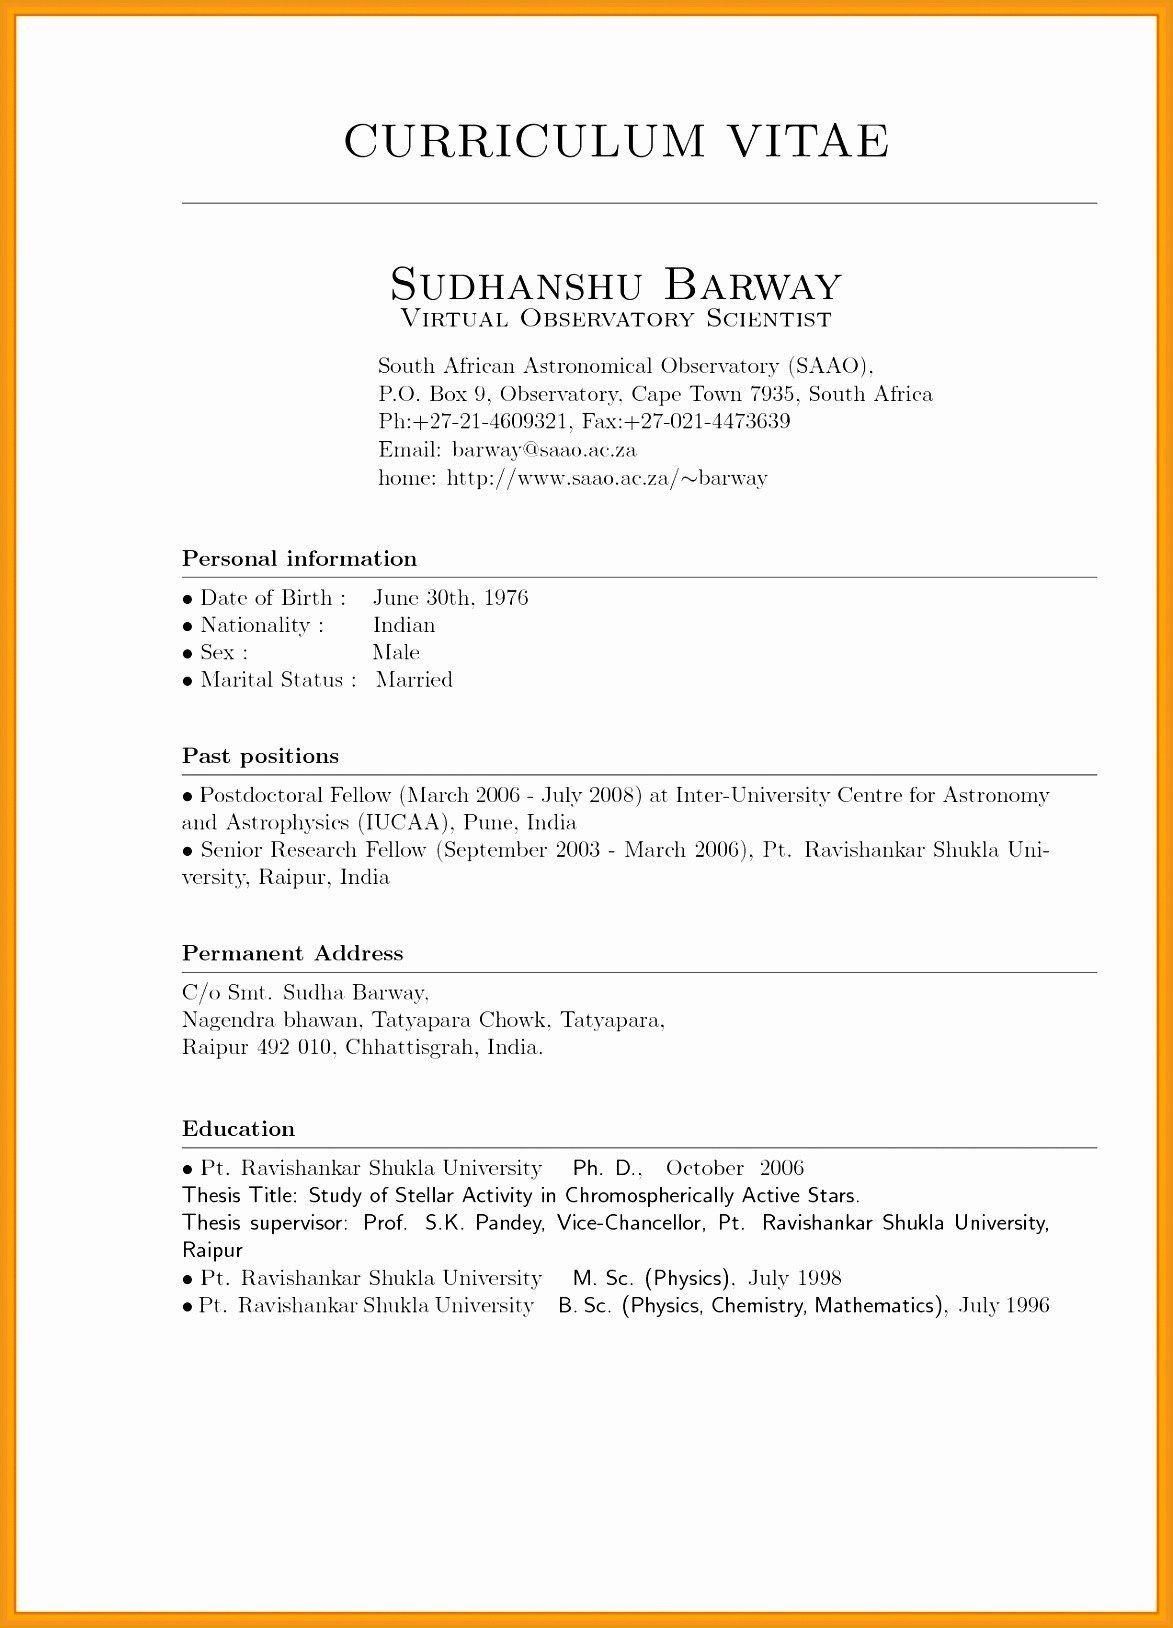 Cv template, Curriculum vitae examples, Resume format